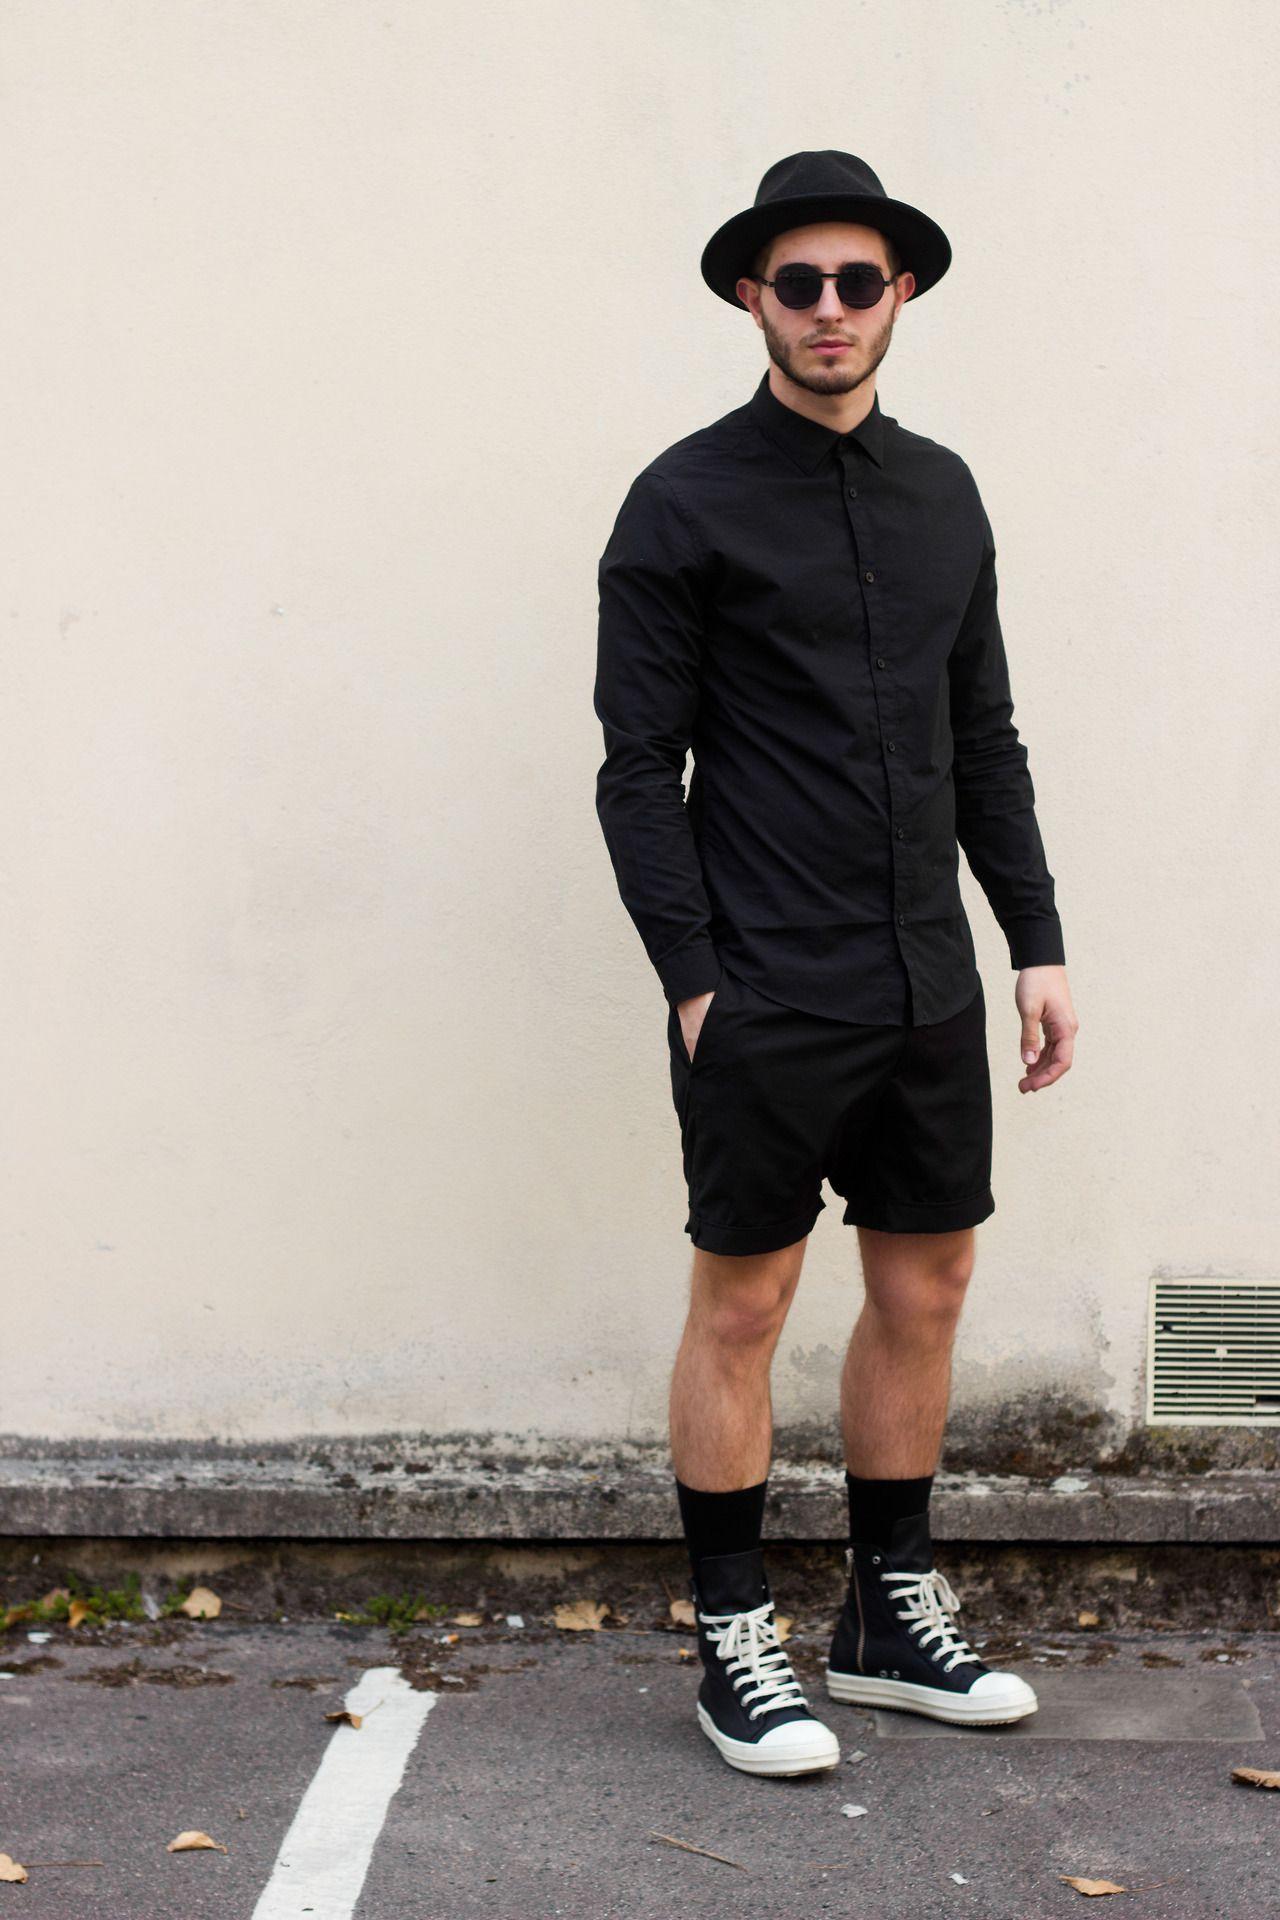 Black Lanoir Outfit and Rick Owens Ramones sneakers. - Nicolas Lauer ... b29b8d45c5a